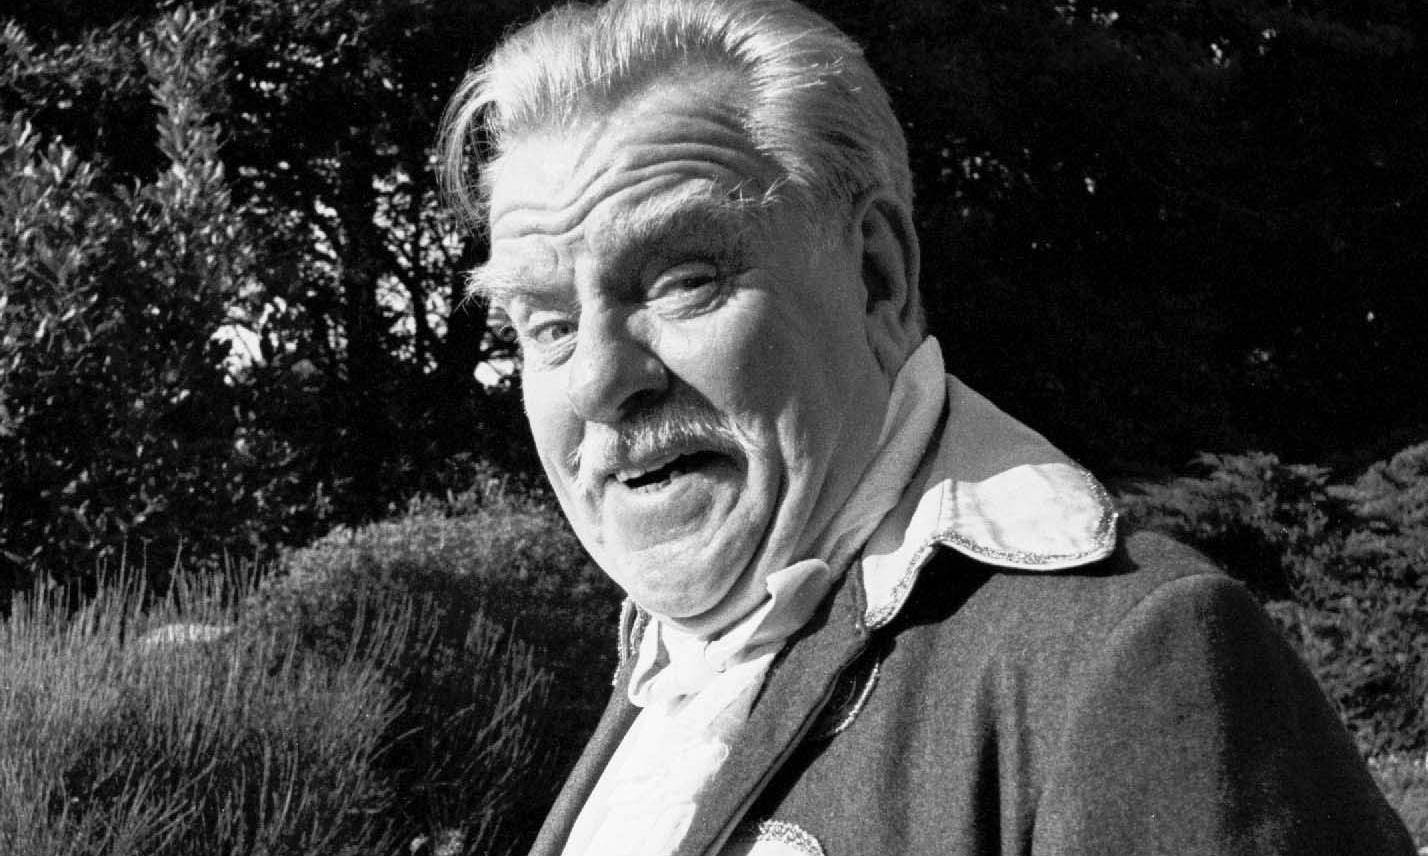 Windsor Davies, It Ain't Half Hot Mum actor, dies aged 88